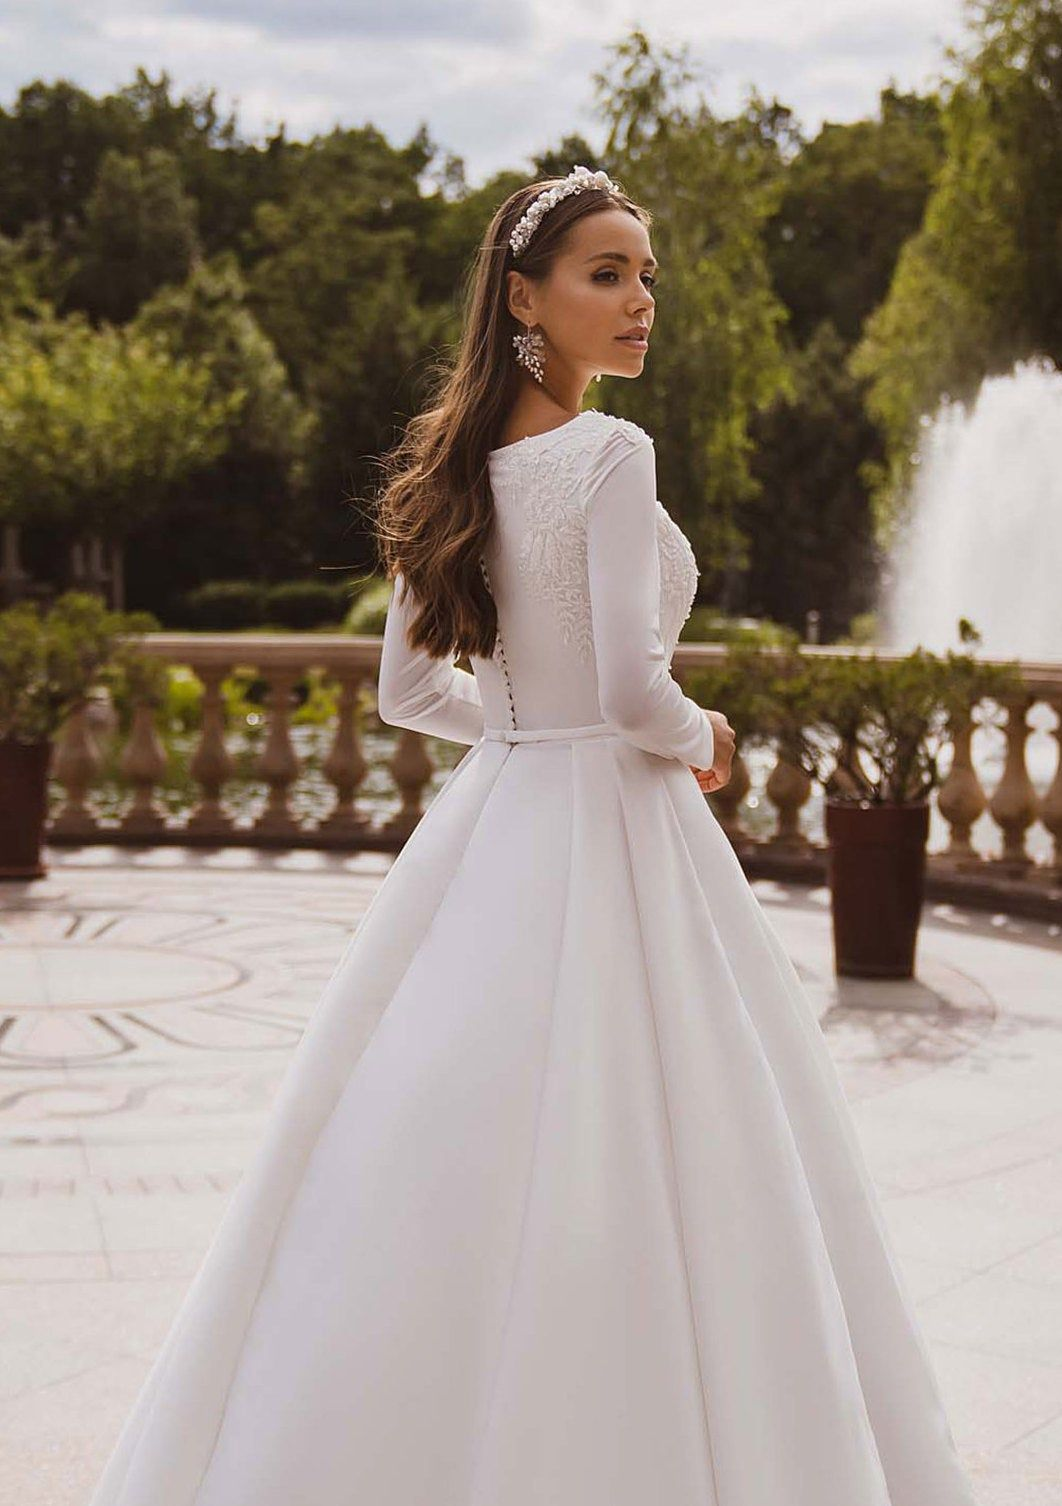 Simple Wedding Dress Long Sleeve Wedding Dress Modest Wedding Dress Plus Size Wedding Dress With Sleeves Satin Wedding Dress Wedding Dresses Winter Wedding Dress Plus Size Wedding Dresses With Sleeves Wedding